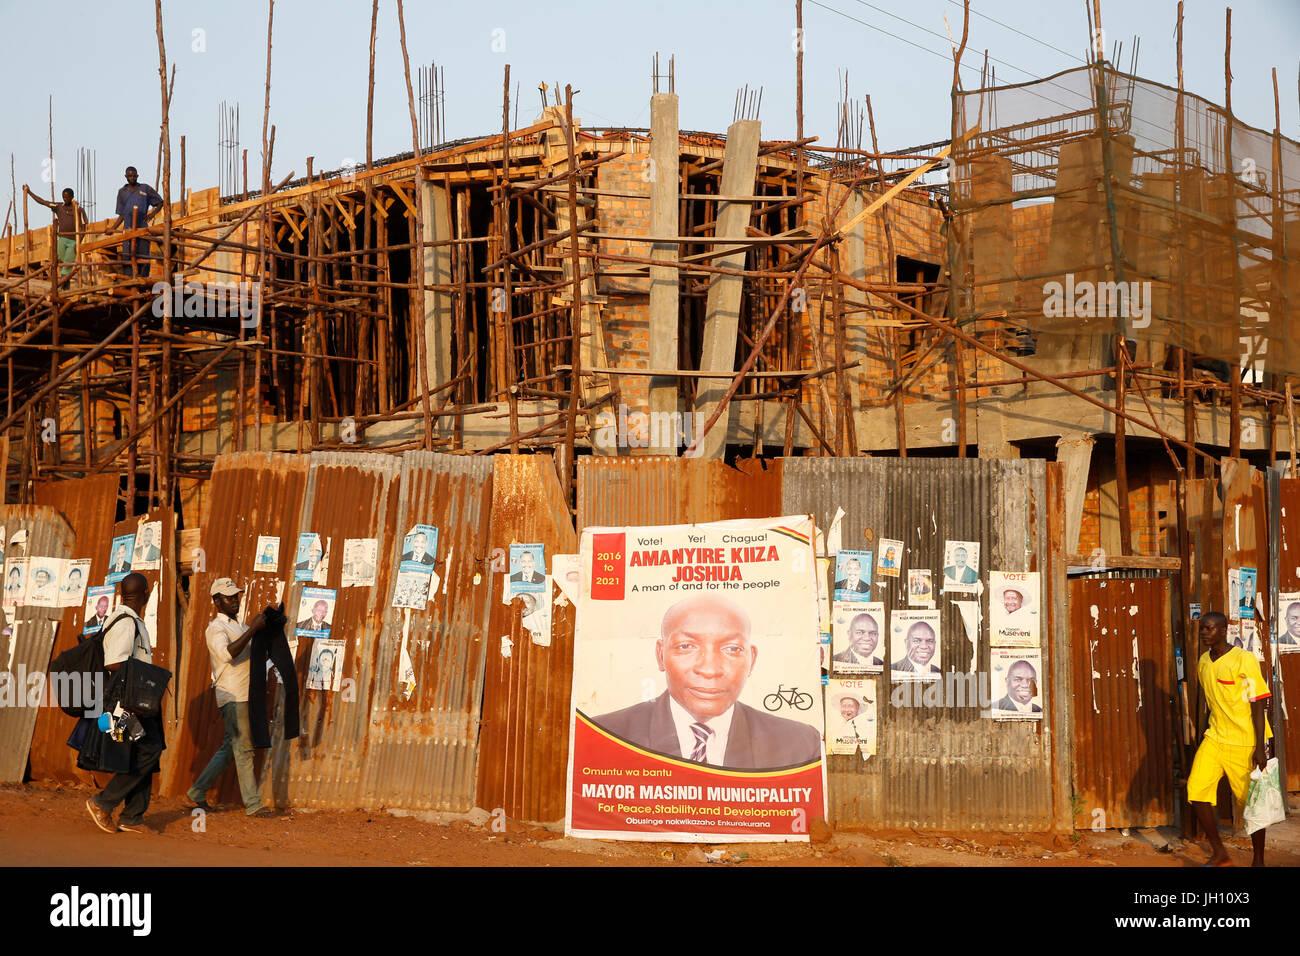 Election poster and scaffolding in Masindi. Uganda. - Stock Image